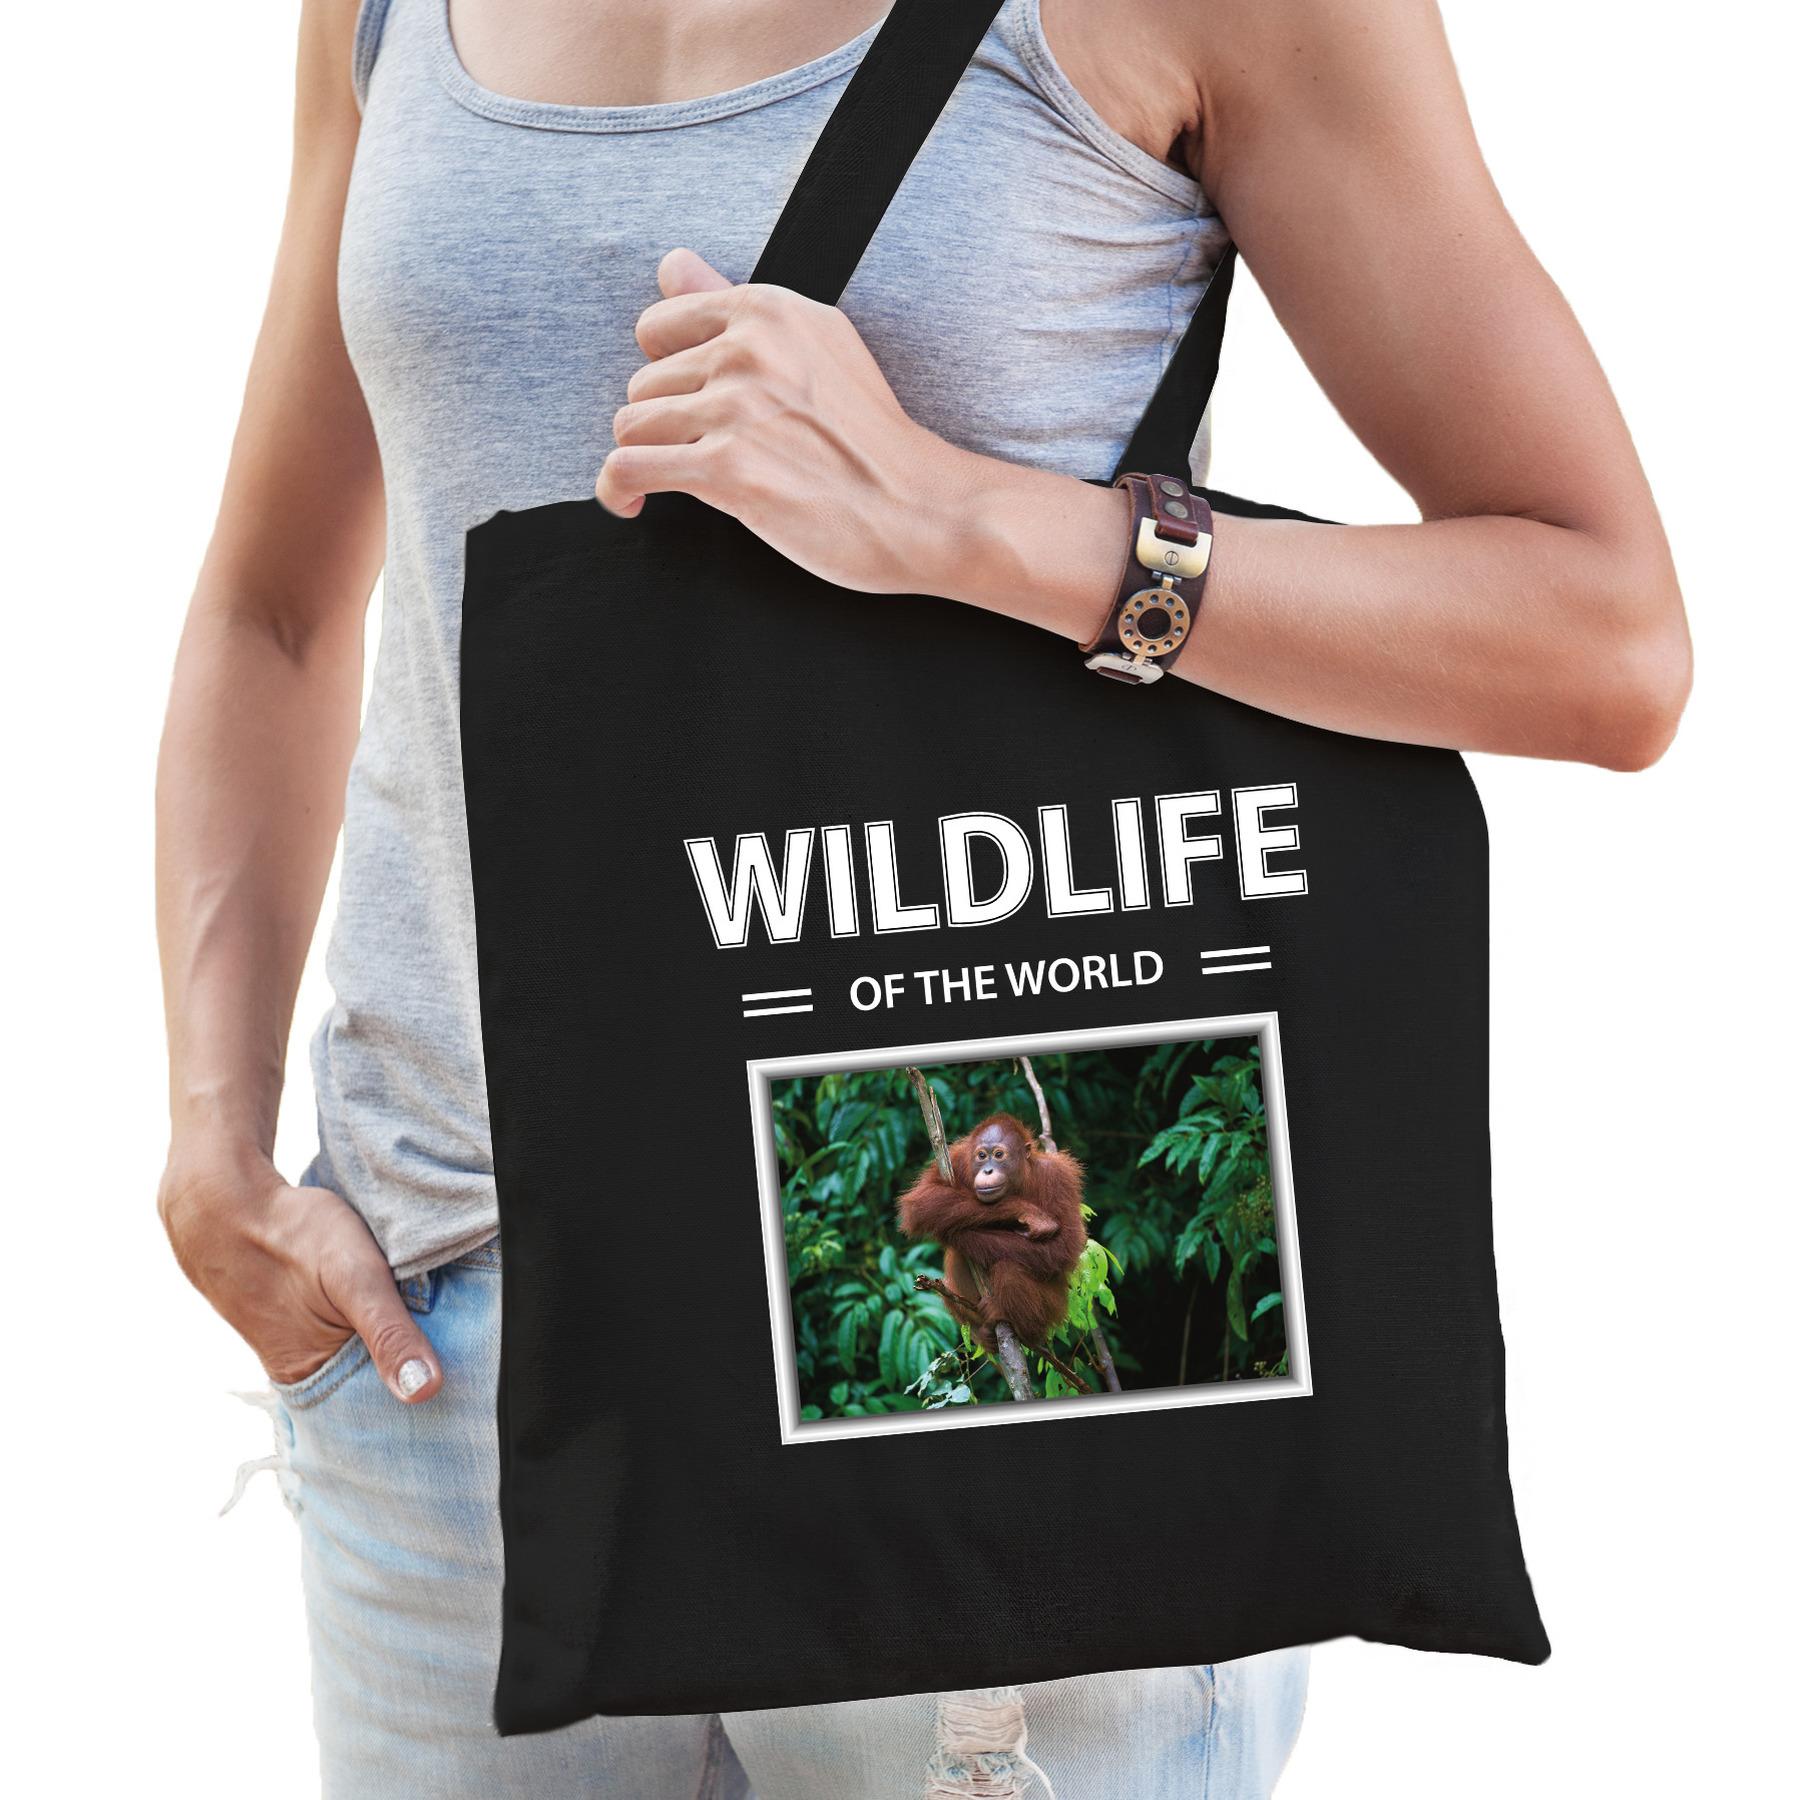 Katoenen tasje Orang oetans zwart - wildlife of the world Orang oetan aap cadeau tas